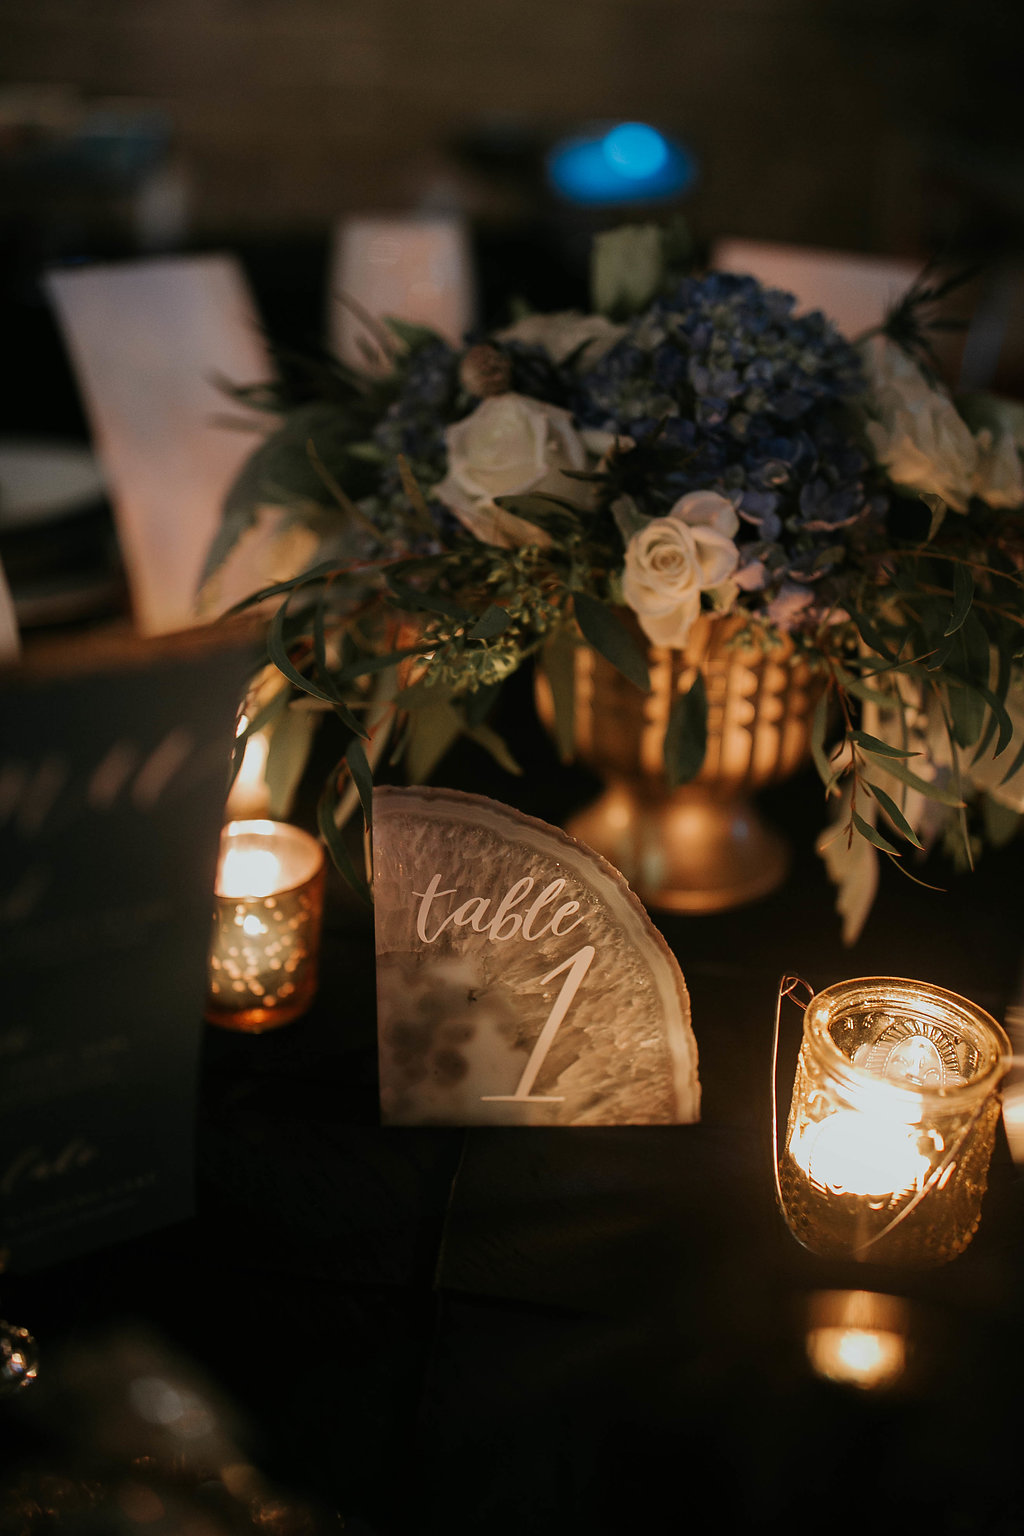 The_Big_Fake_wedding_Seattle_Within_sodo_wedding_by_Adina_Preston_Weddings_398.JPG